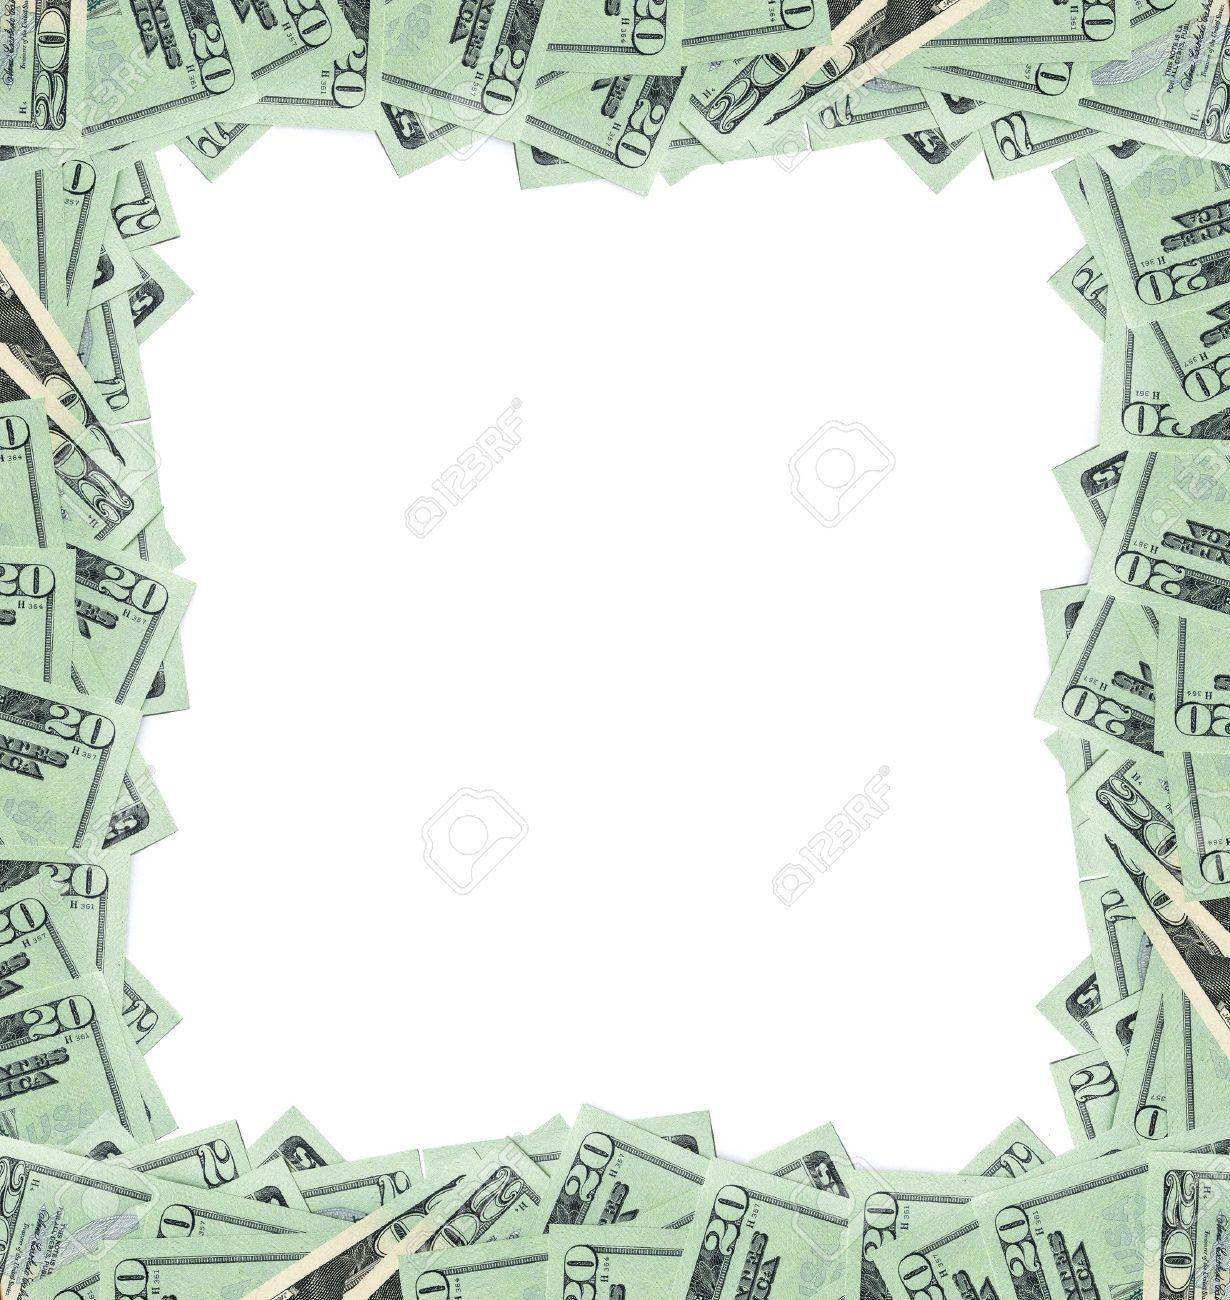 Dollar border clipart 7 » Clipart Portal.